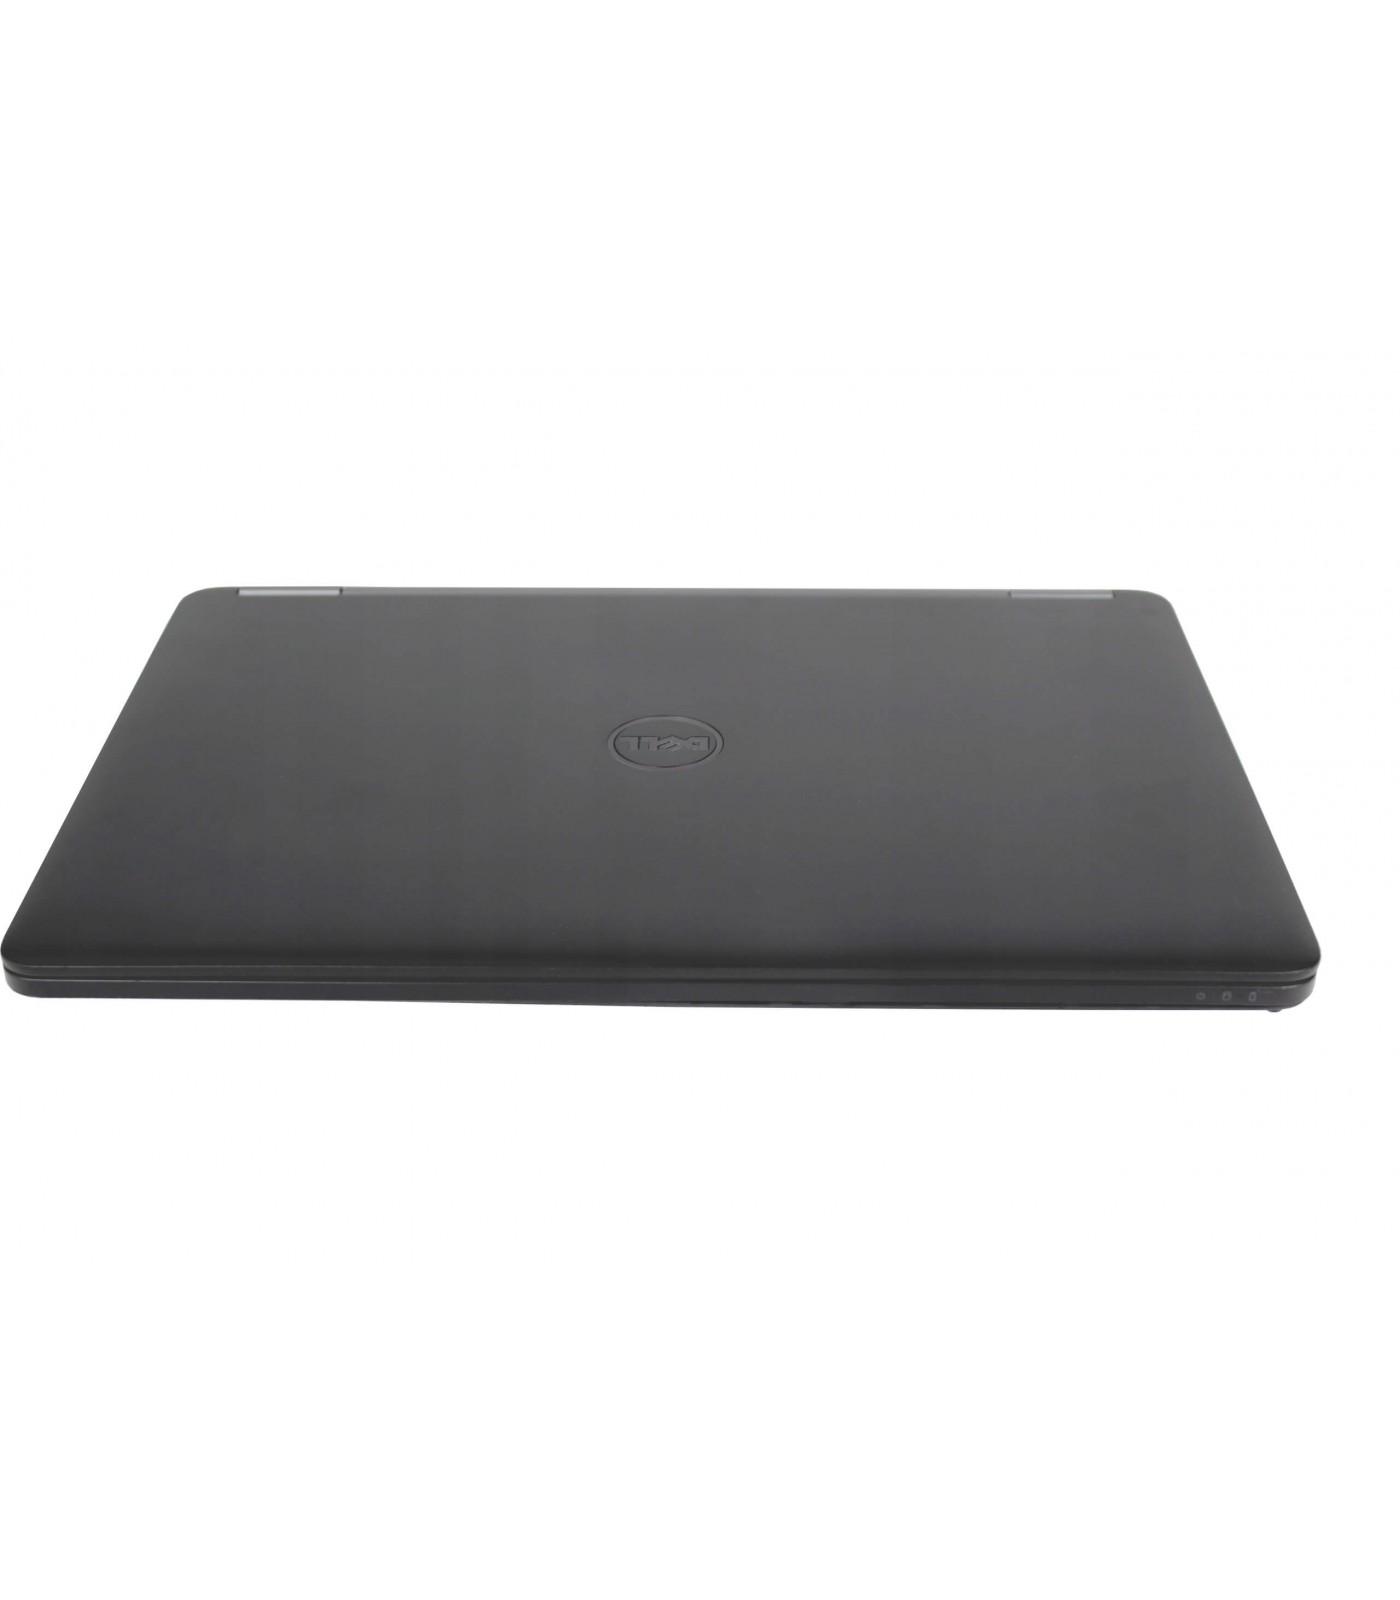 Poleasingowy laptop Dell Latitude E7270 z Intel Core i5-6300U w klasie A-